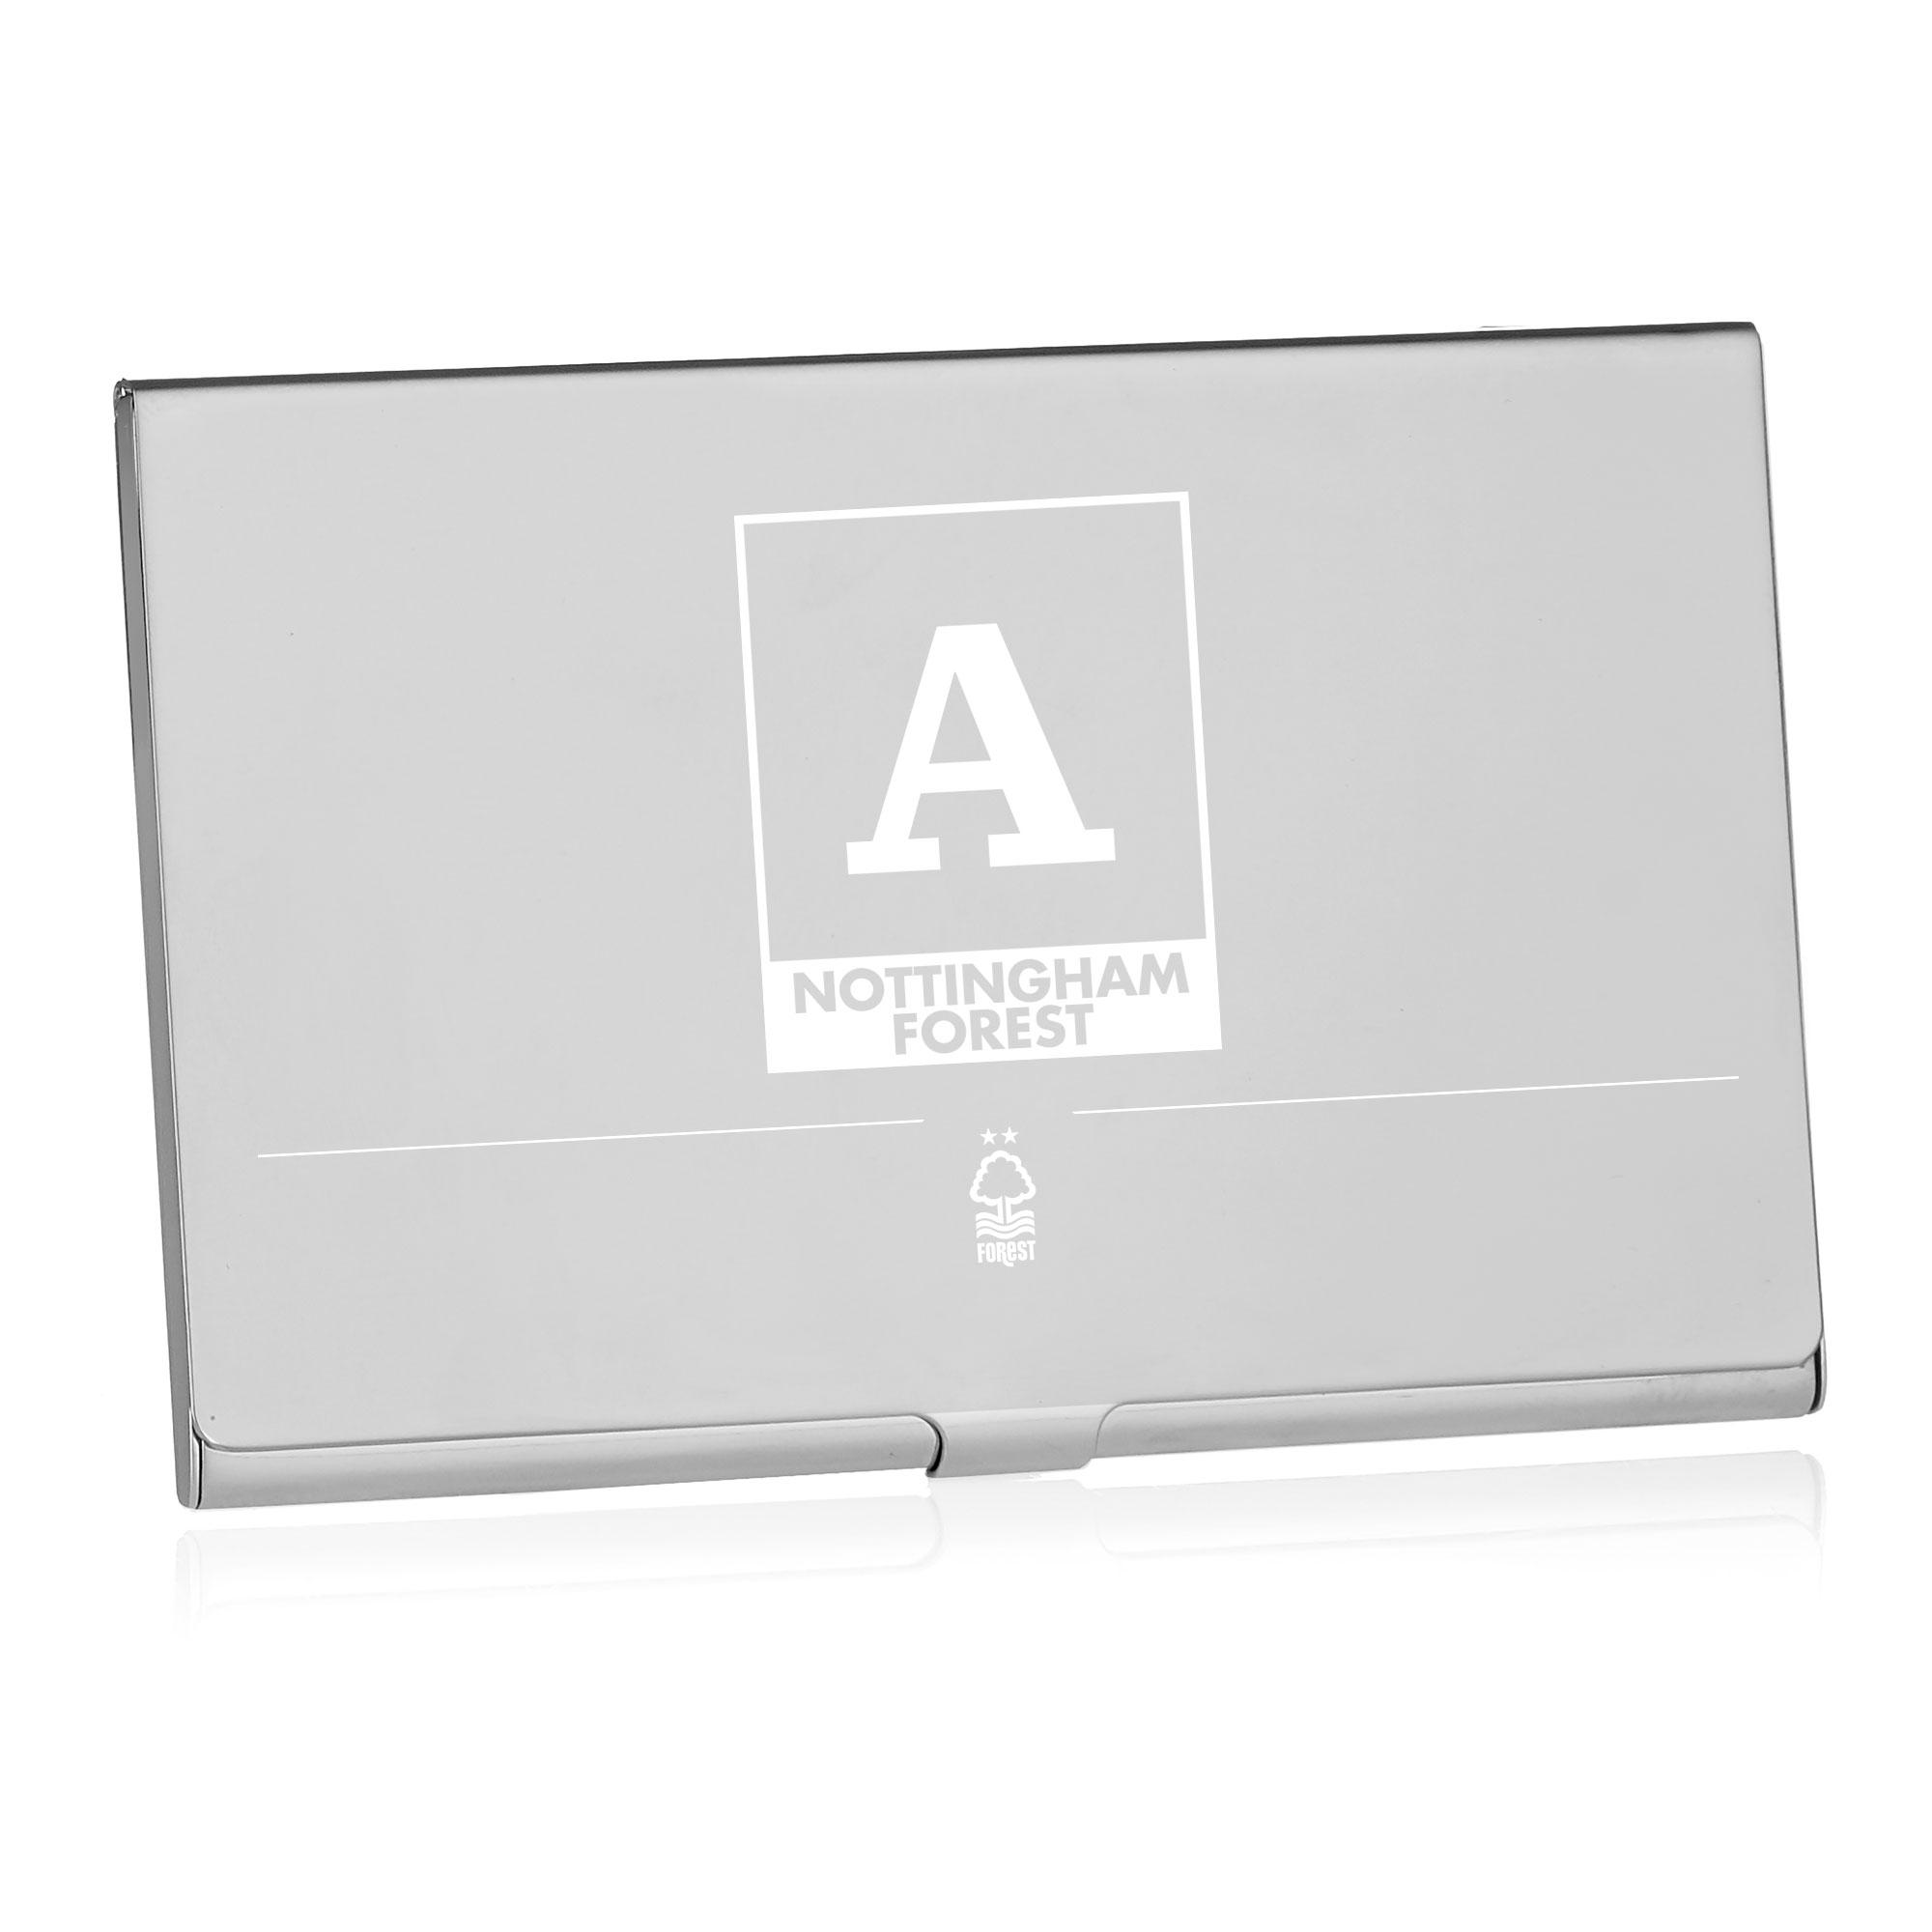 Nottingham Forest FC Monogram Business Card Holder